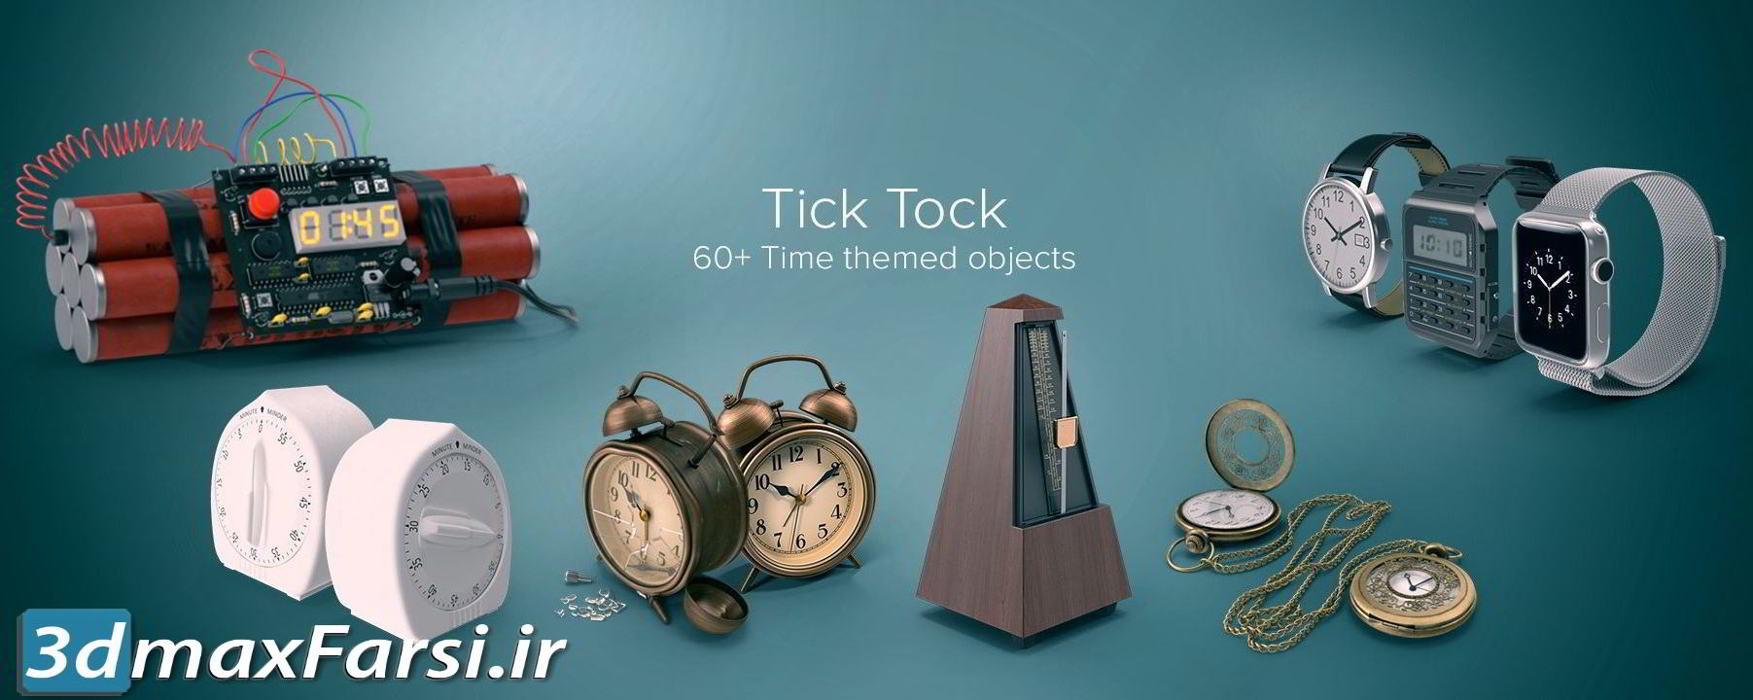 تصاویر گرافیکی ساعت PixelSquid – Tick Tock Collection